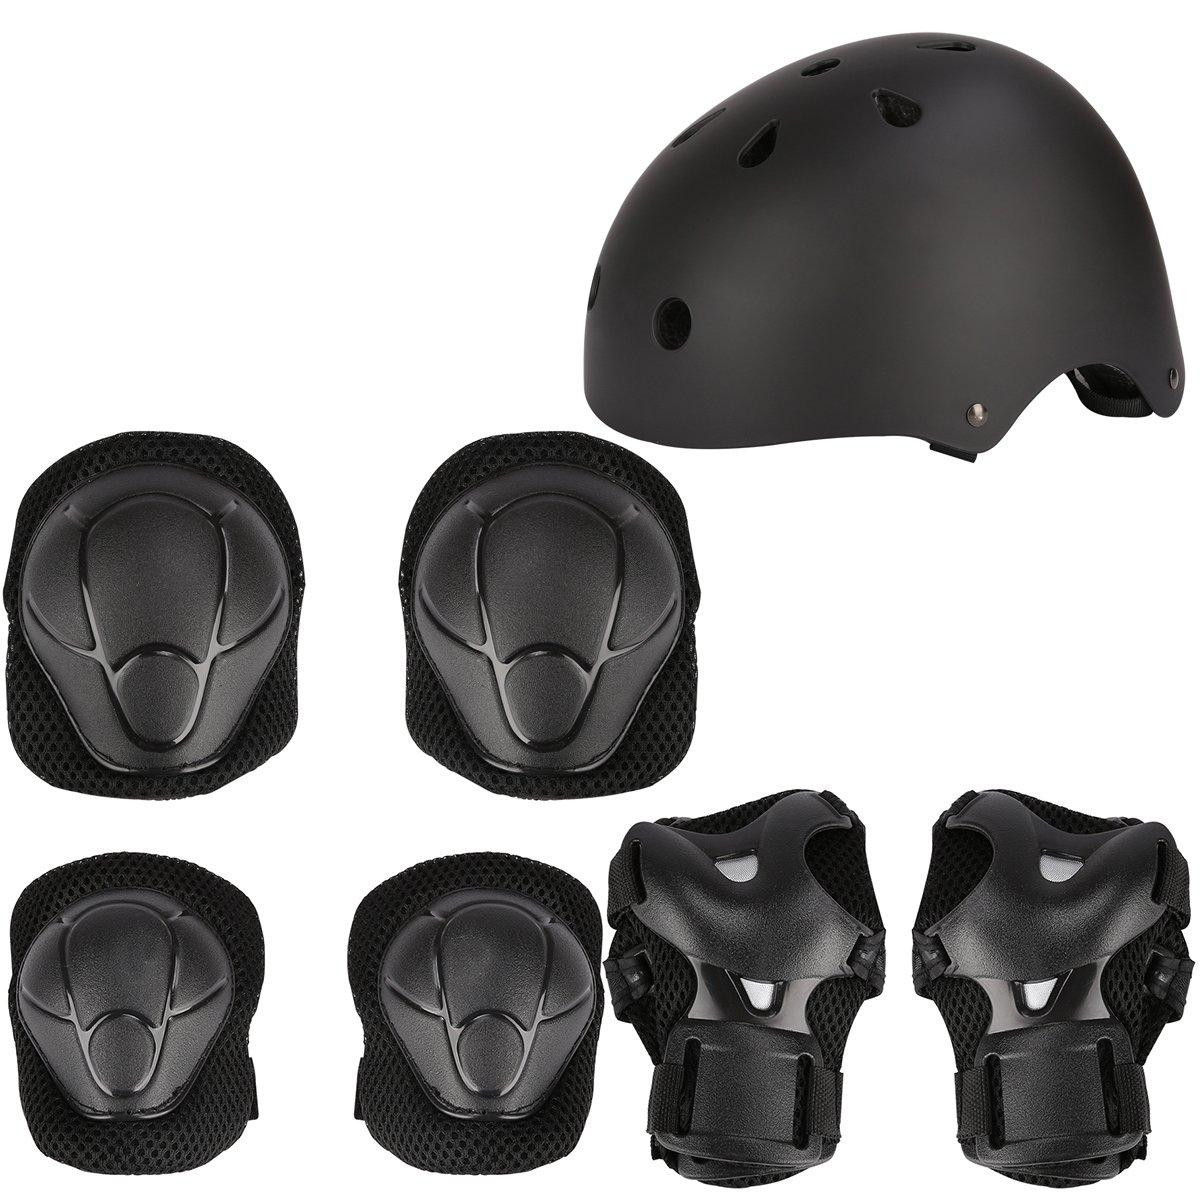 Herbalcandybox Kid's Protective Gear Set with Wrist Guard Knee Pads Elbow Pads Helmet,Black